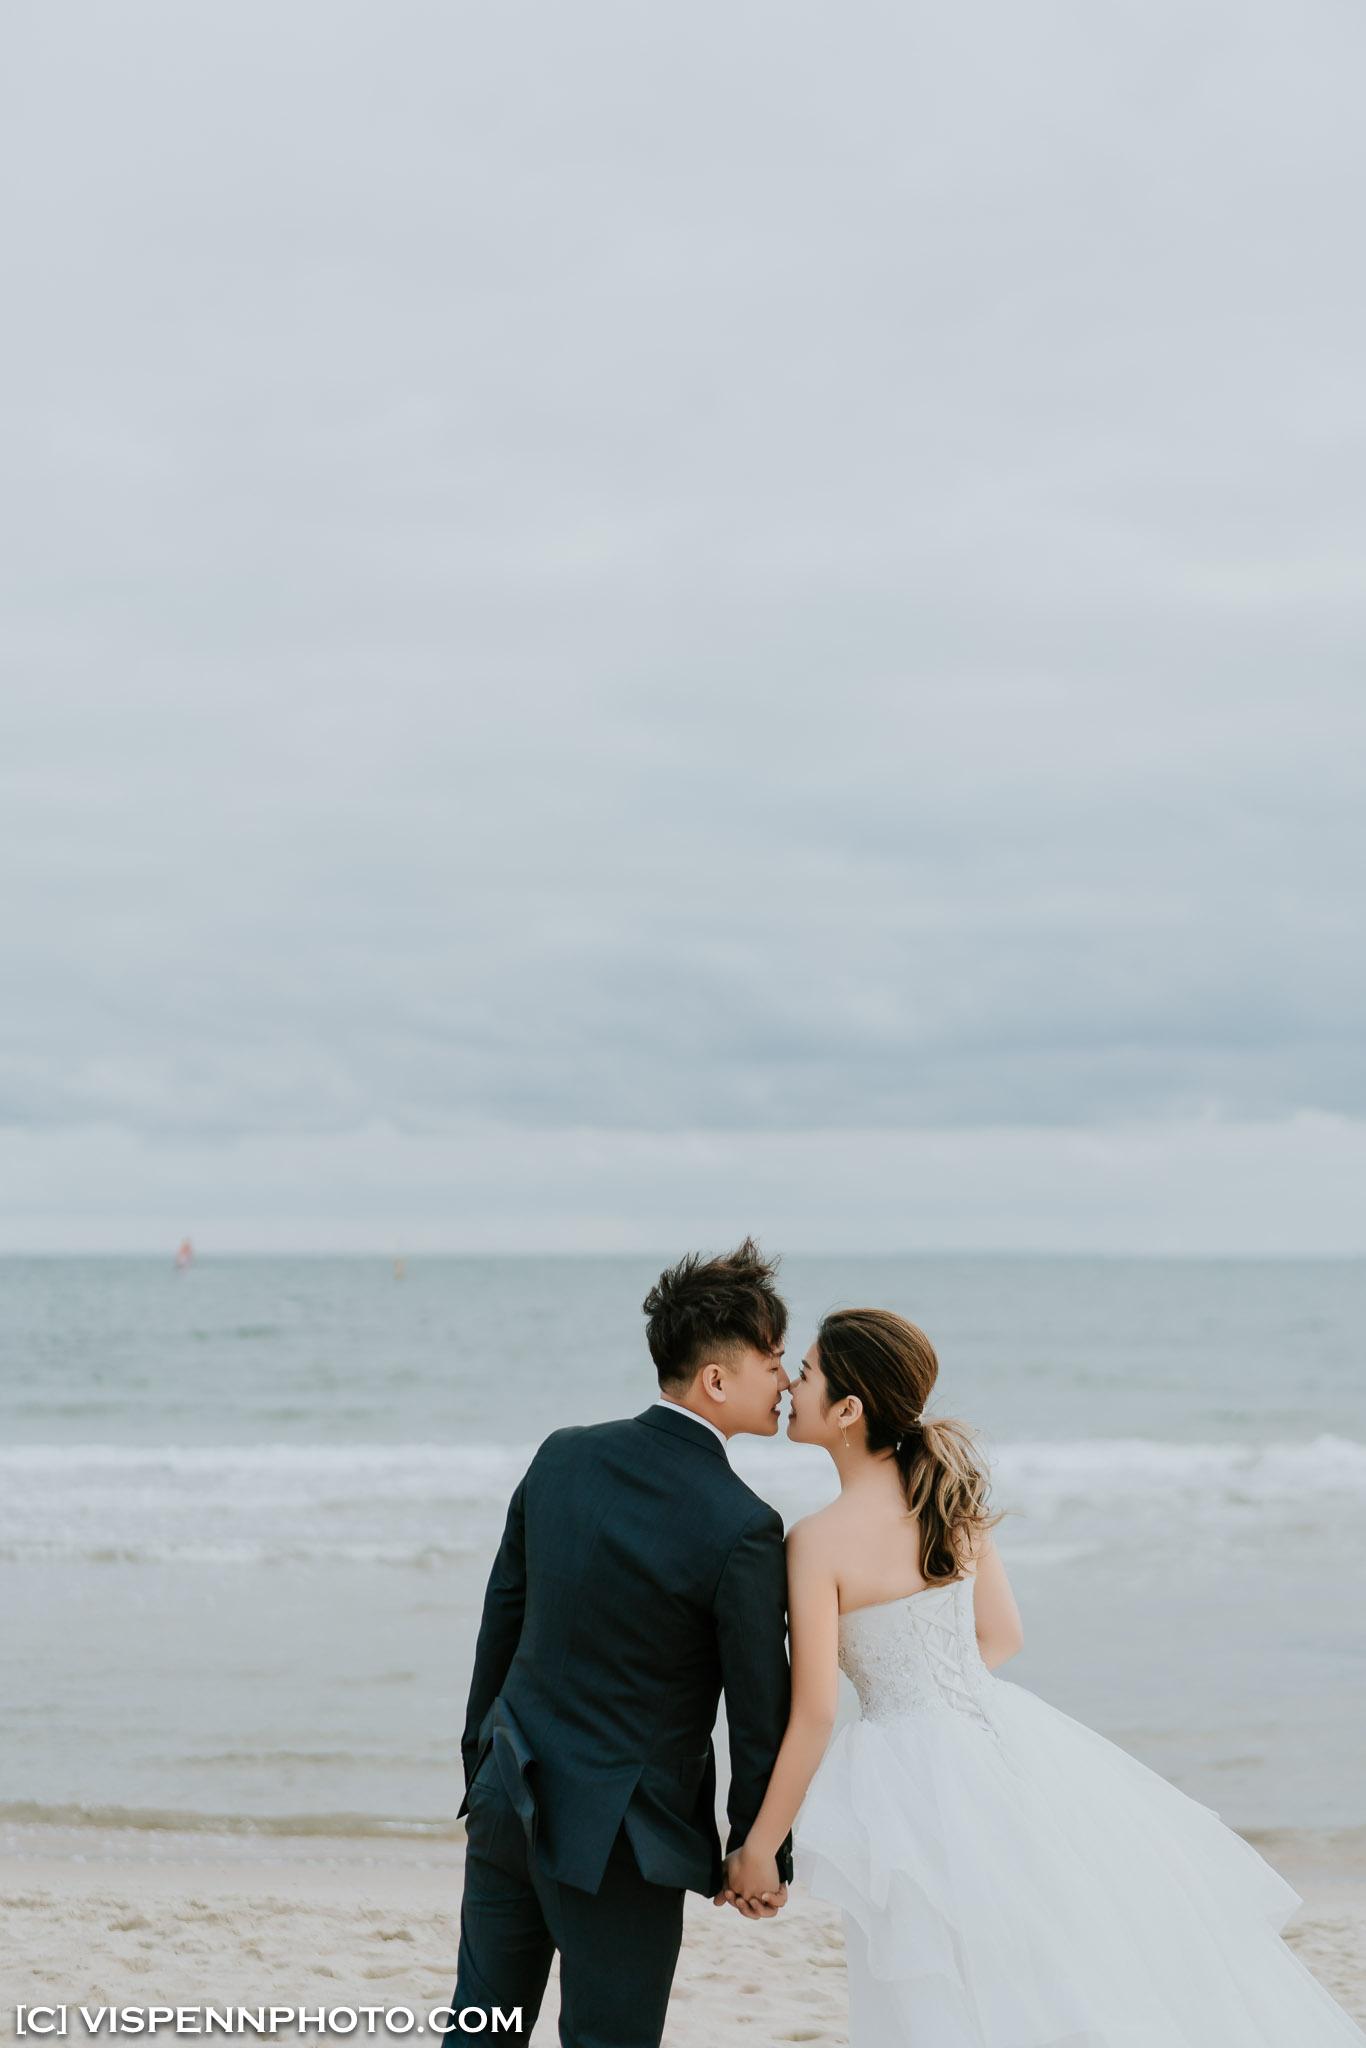 PRE WEDDING Photography Melbourne GiGi 3017 A7R3 ZHPENN